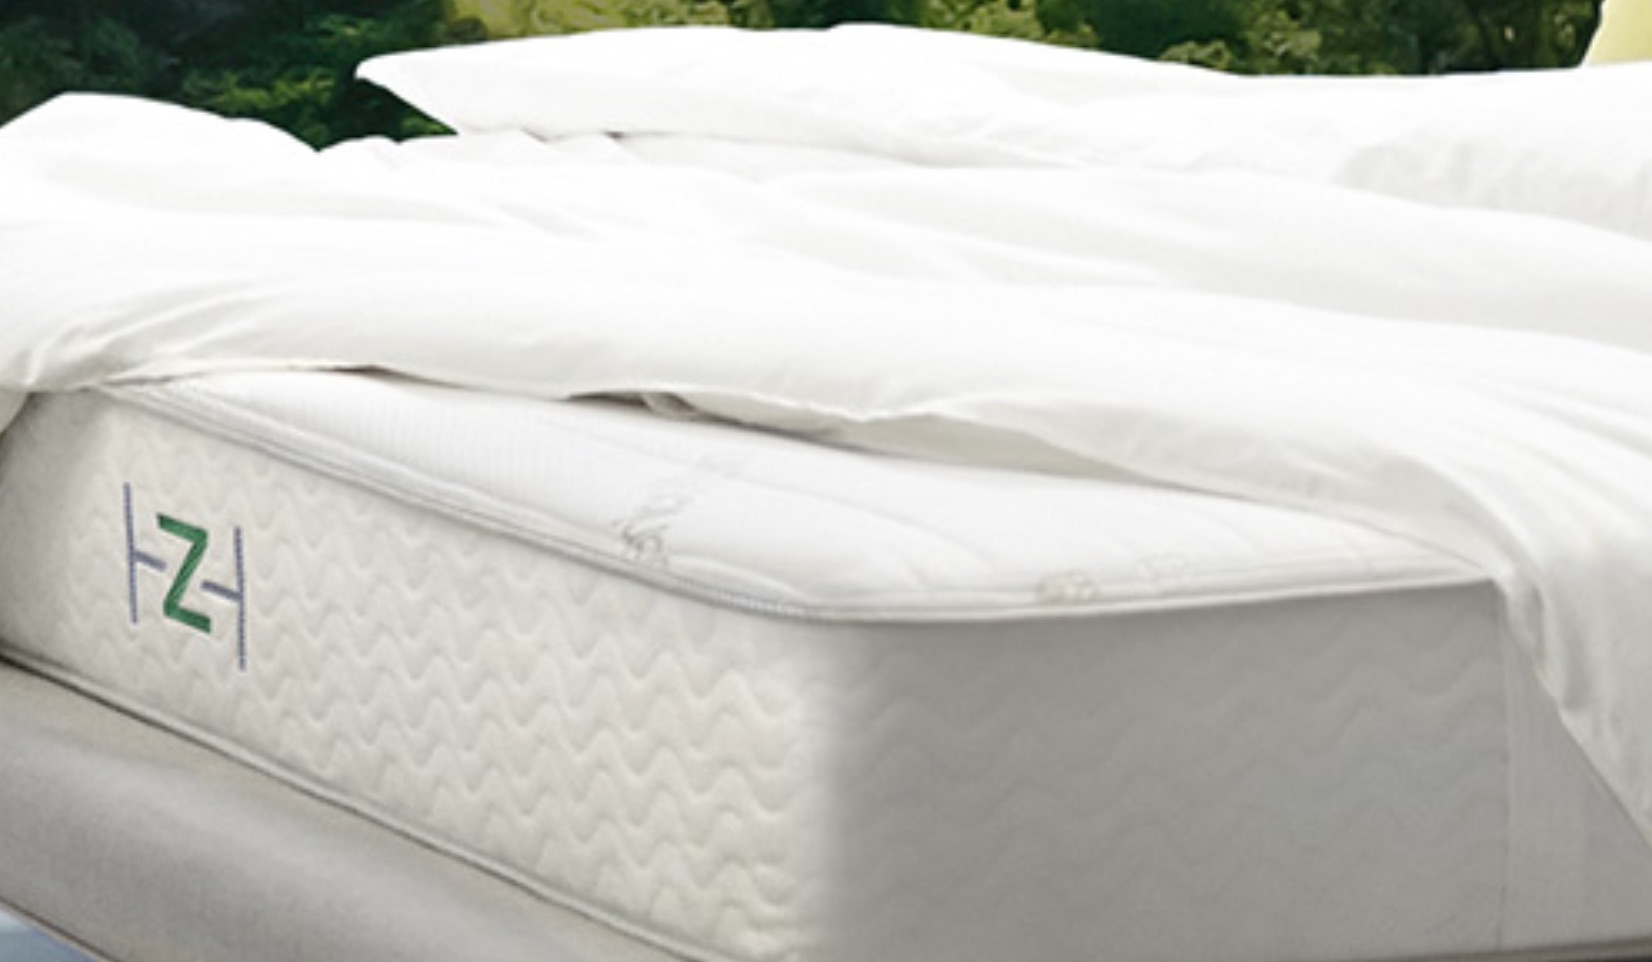 Zenhaven Luxury Plush Mattress Reviews Goodbed Com